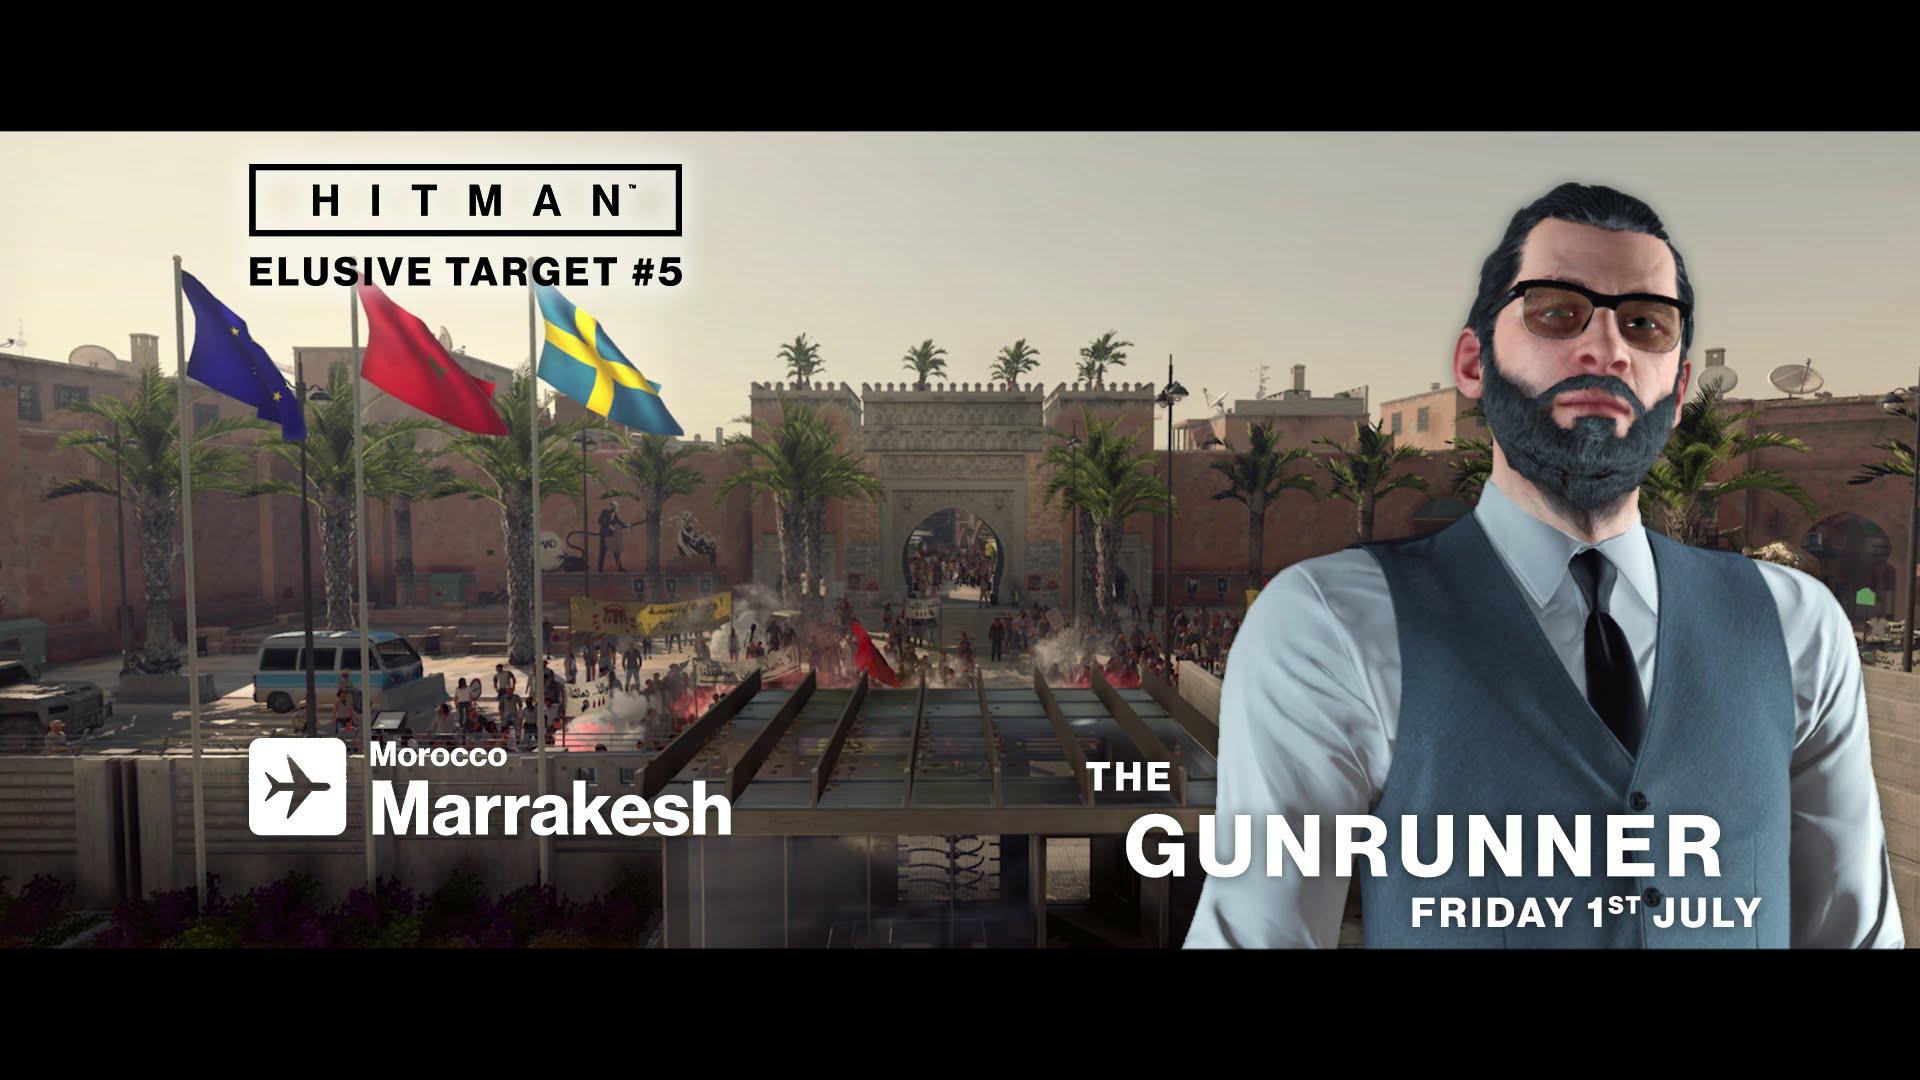 HITMAN - Elusive Target #5 - The Gunrunner